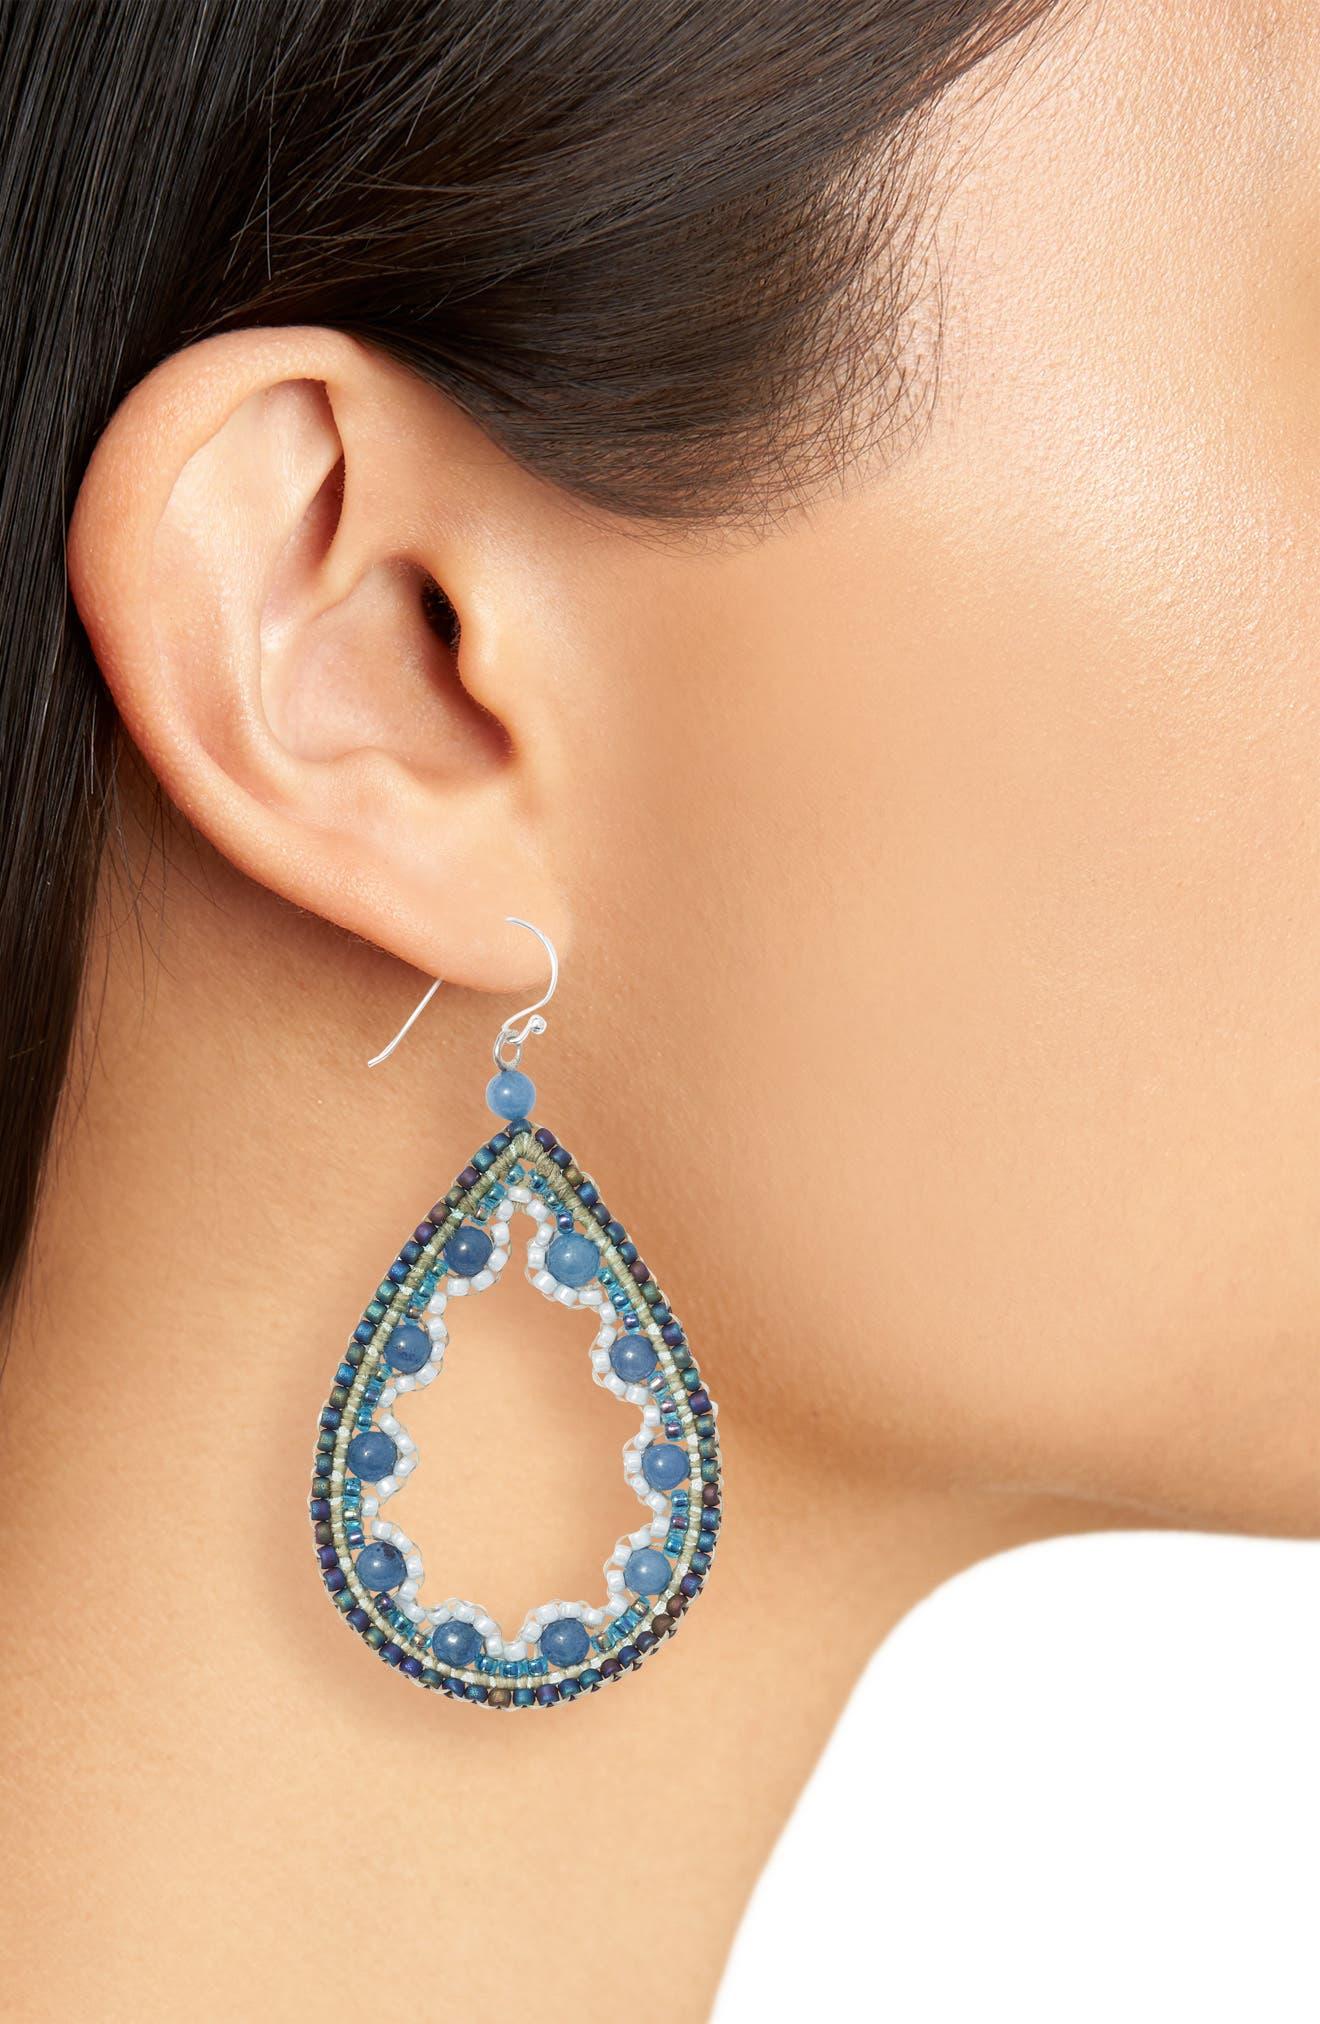 Beaded Agate Teardrop Earrings,                             Alternate thumbnail 2, color,                             Blue